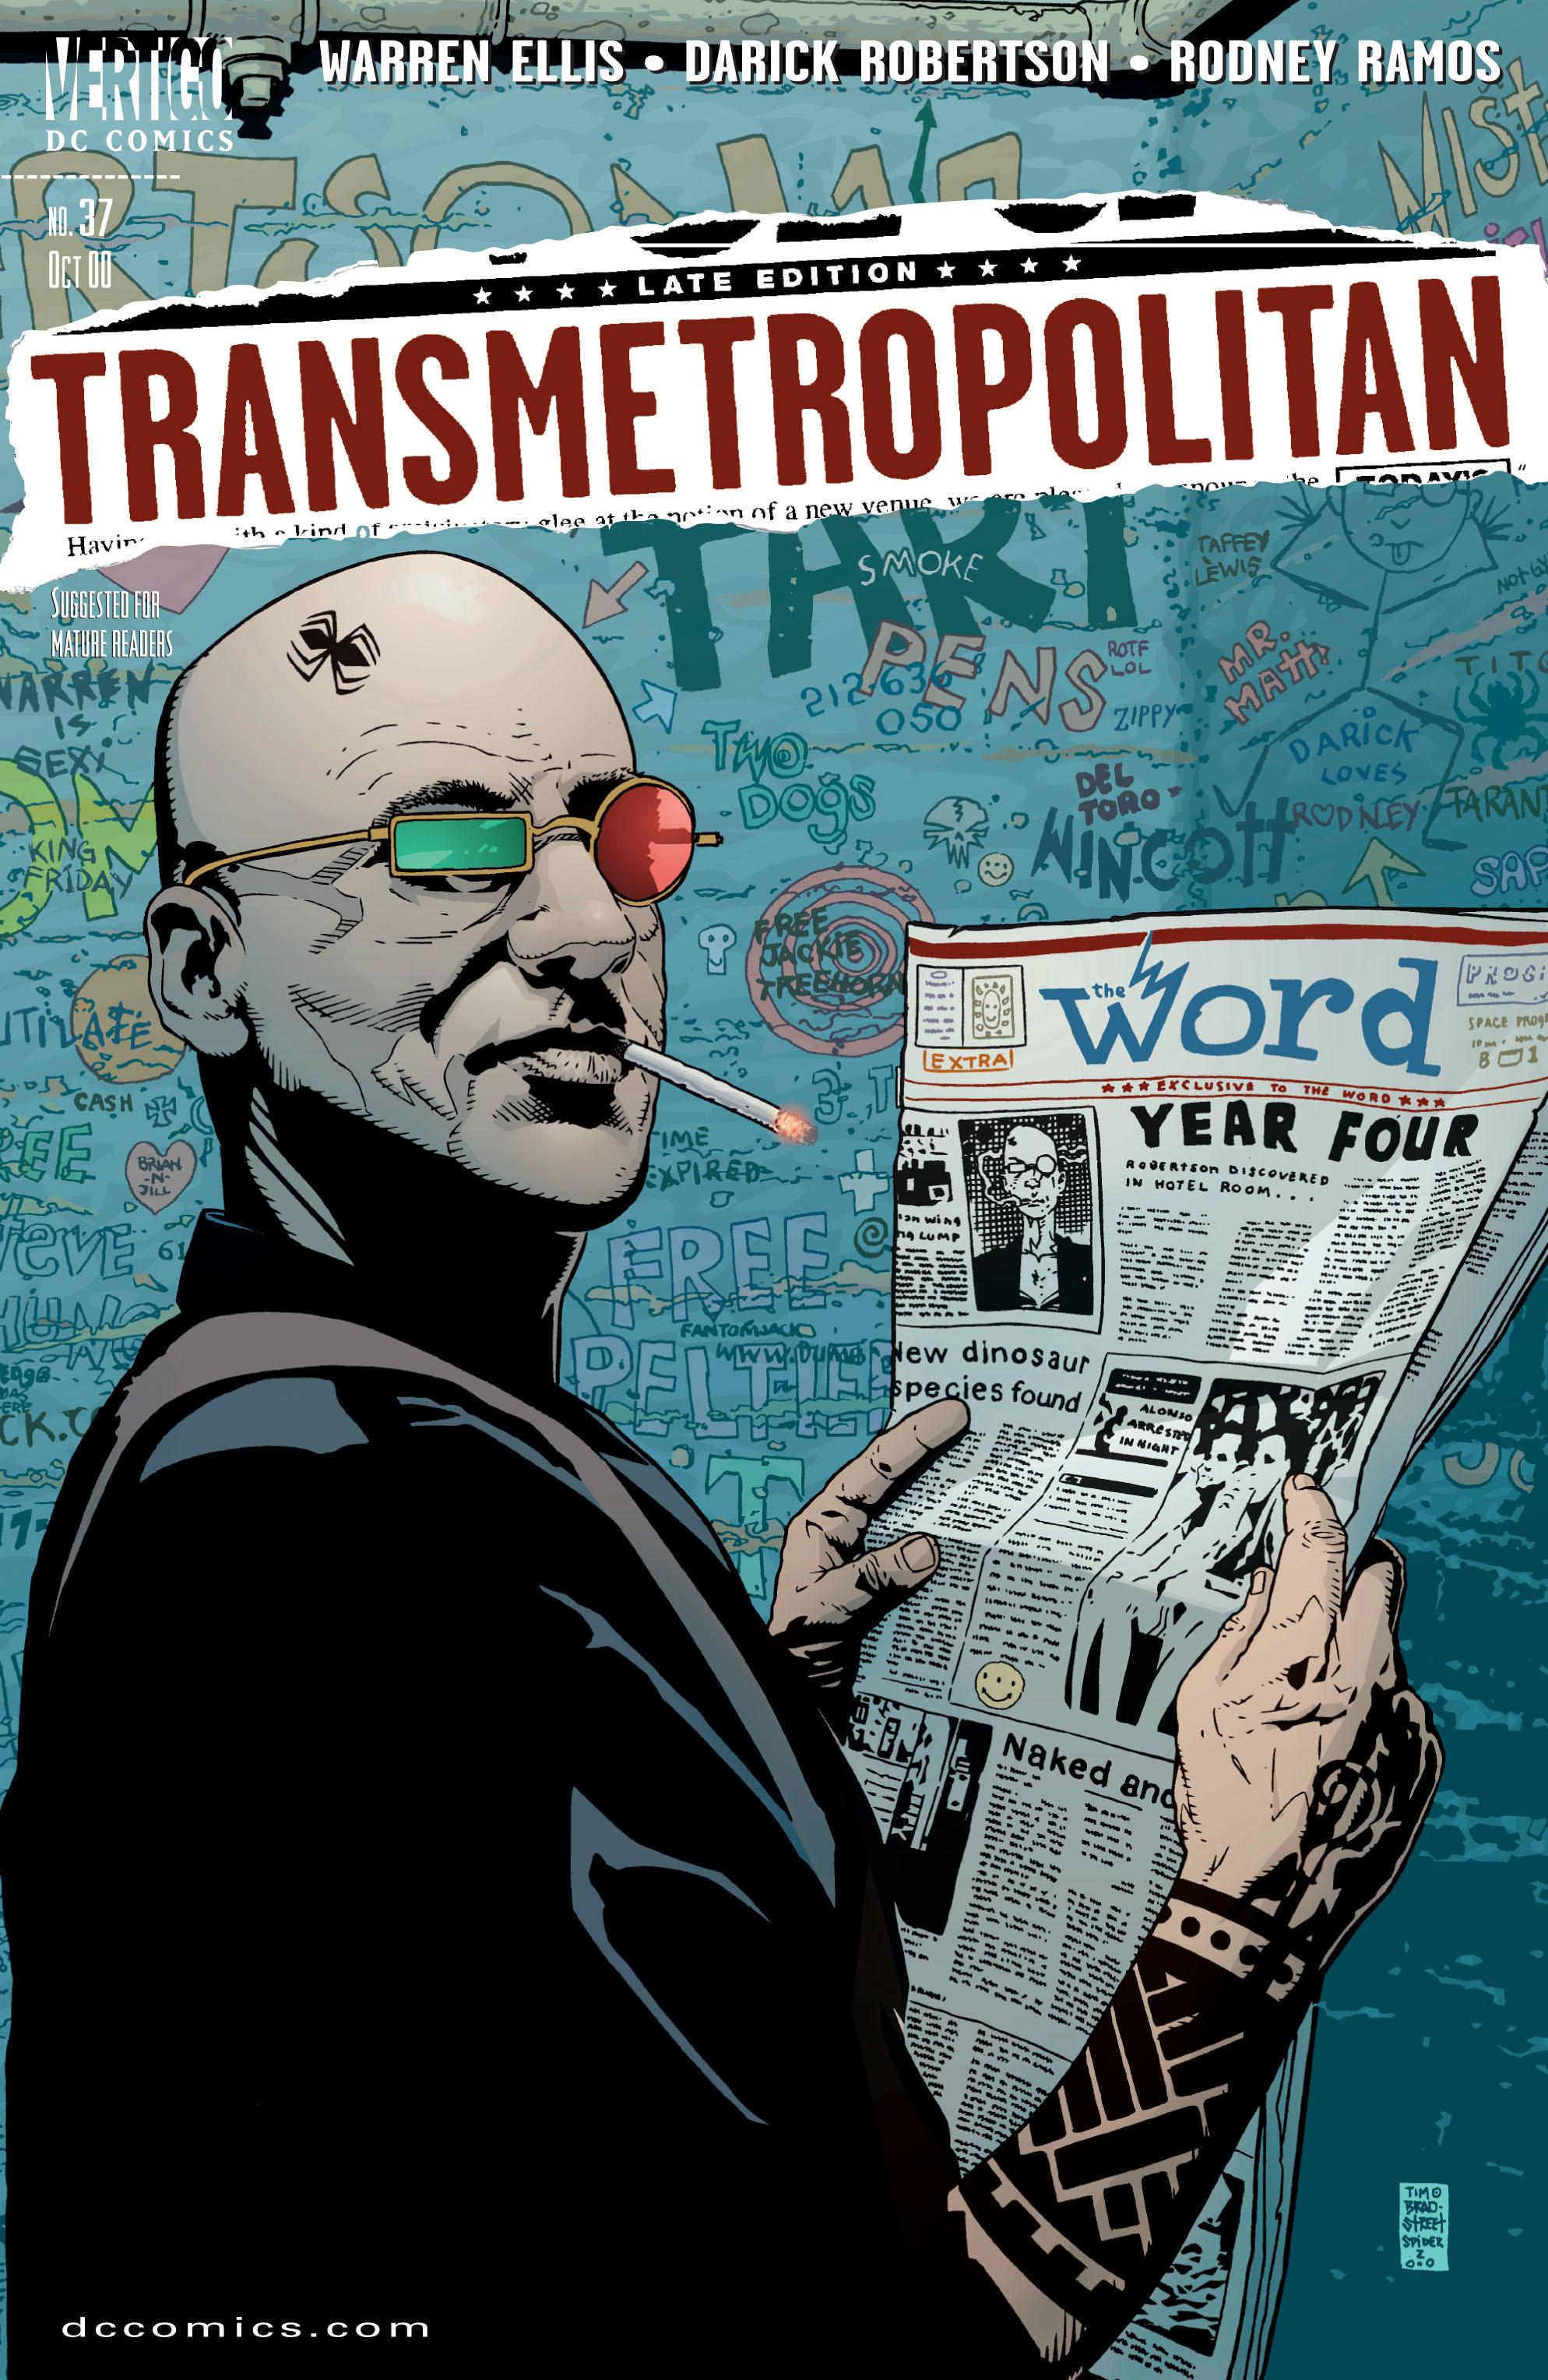 Read online Transmetropolitan comic -  Issue #37 - 1